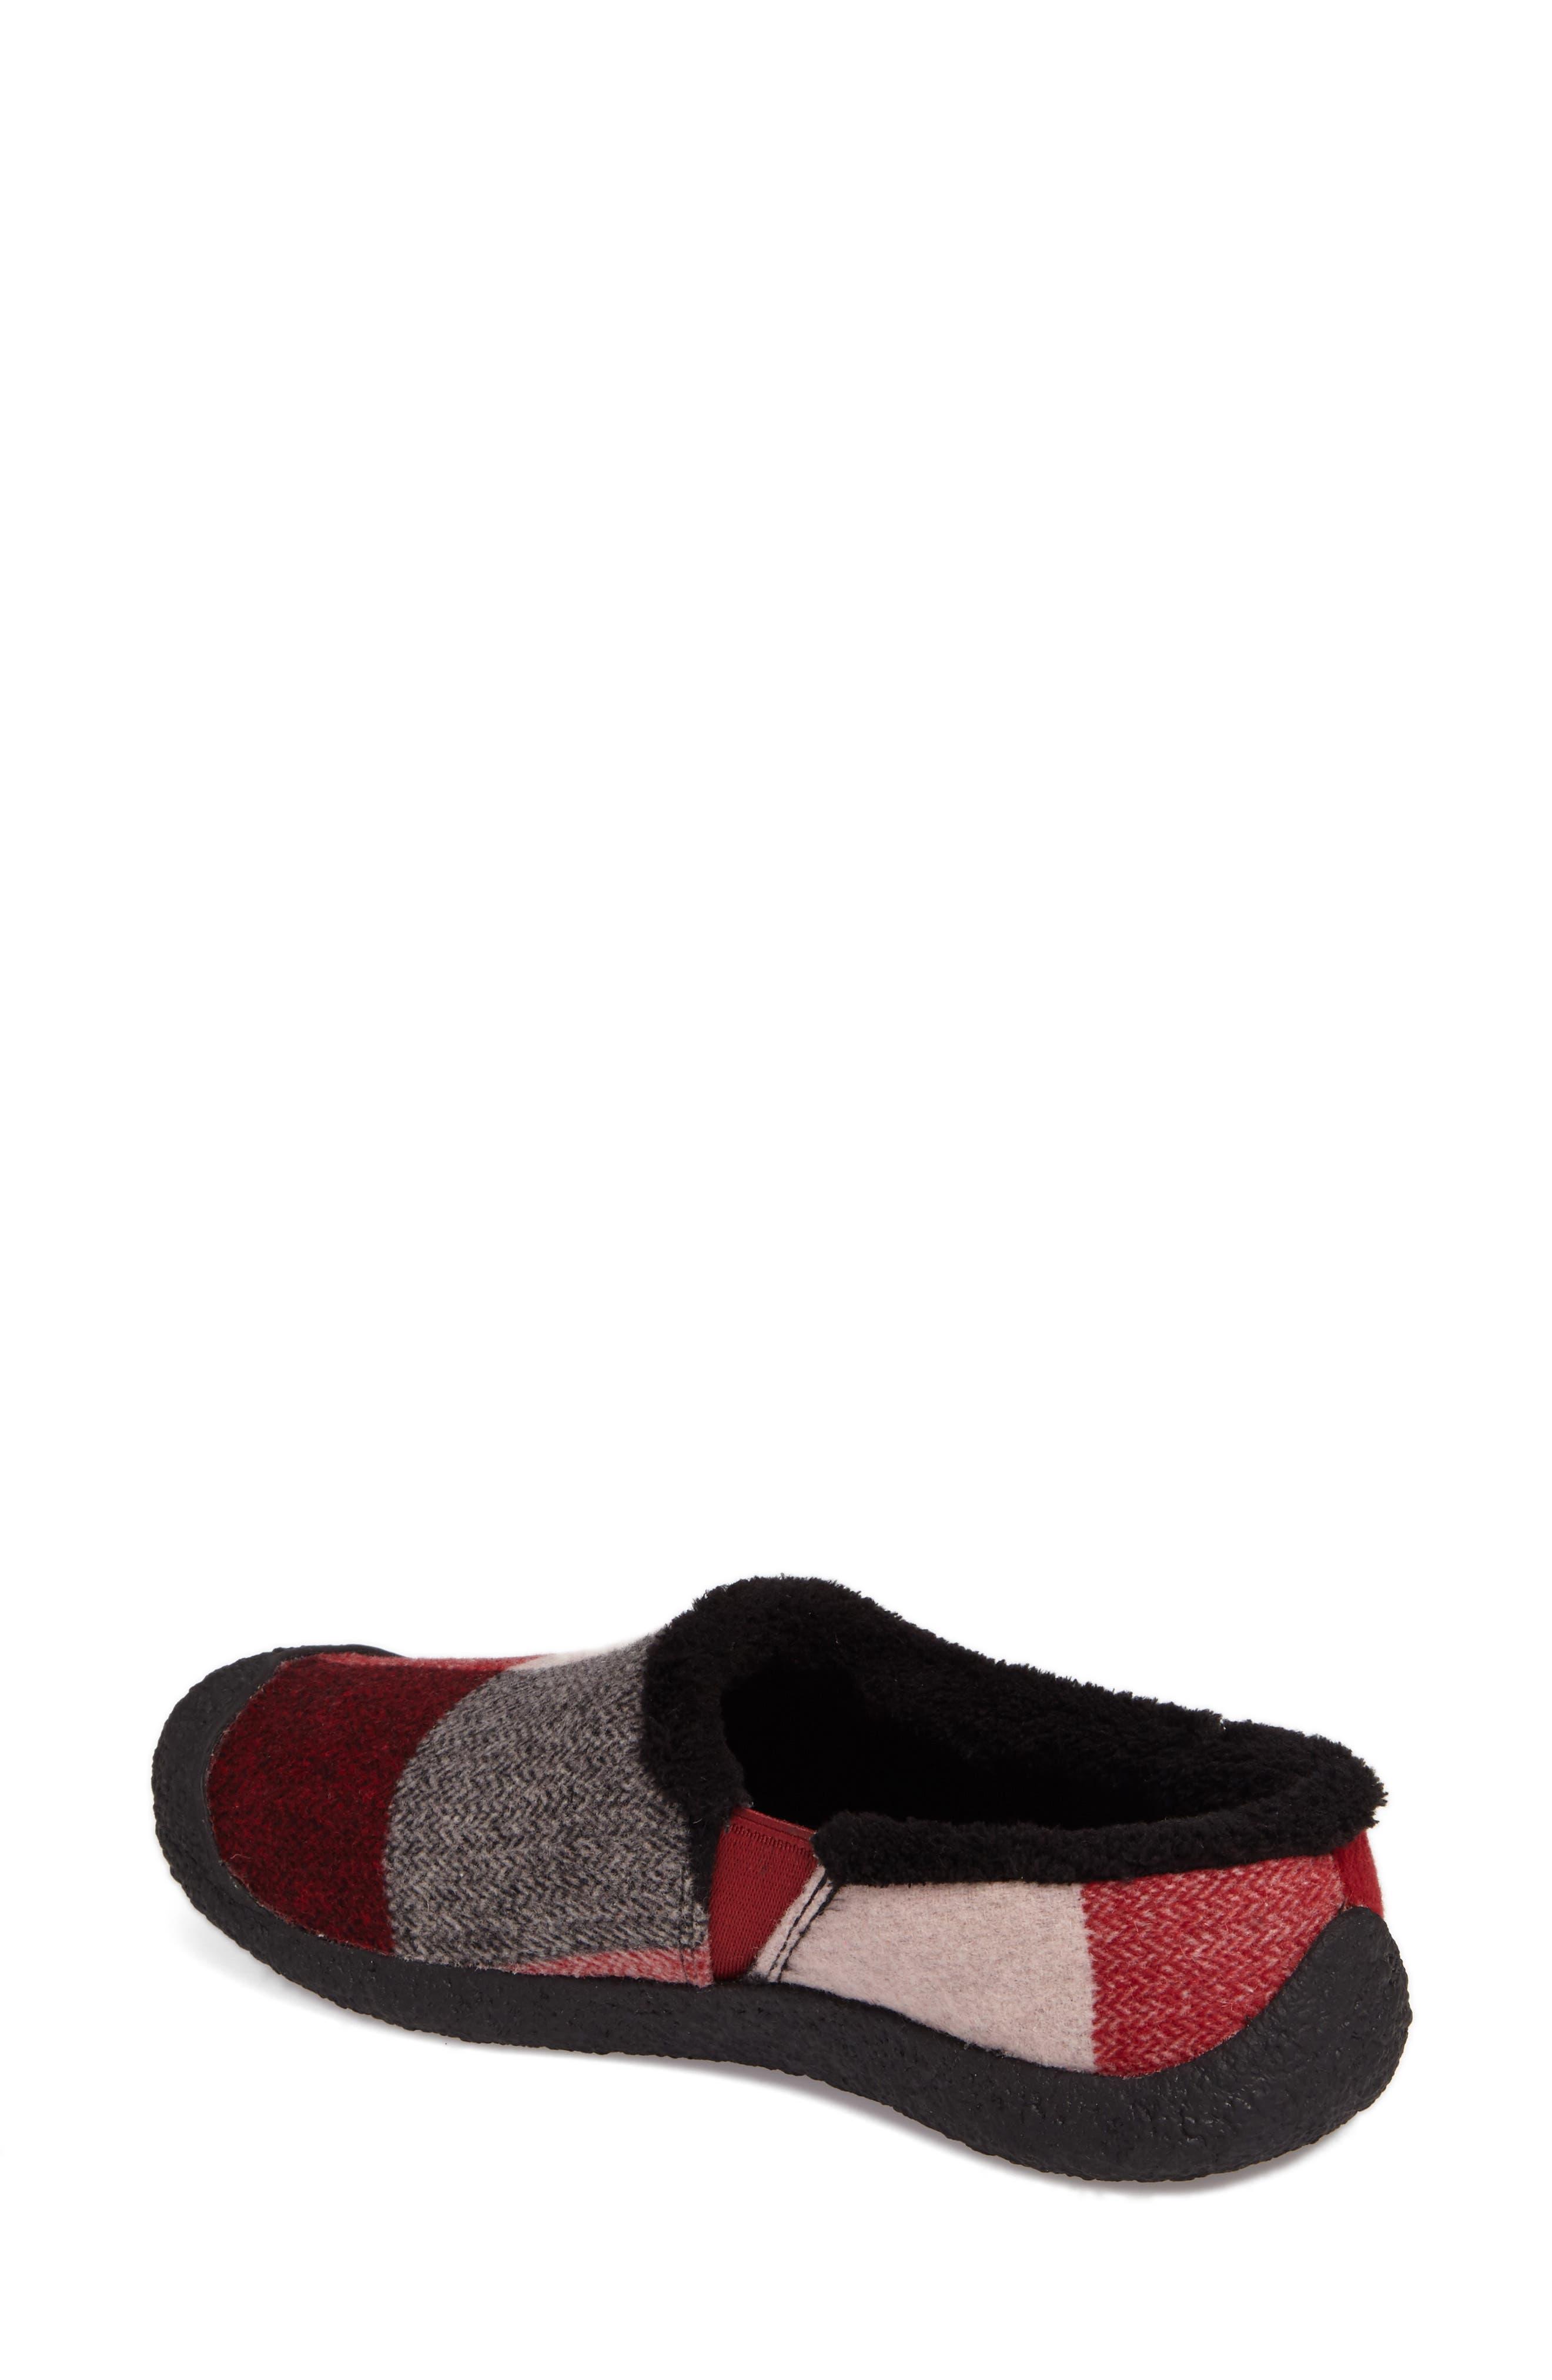 Alternate Image 2  - Keen Howser Round Toe Wool Slip-on (Women)